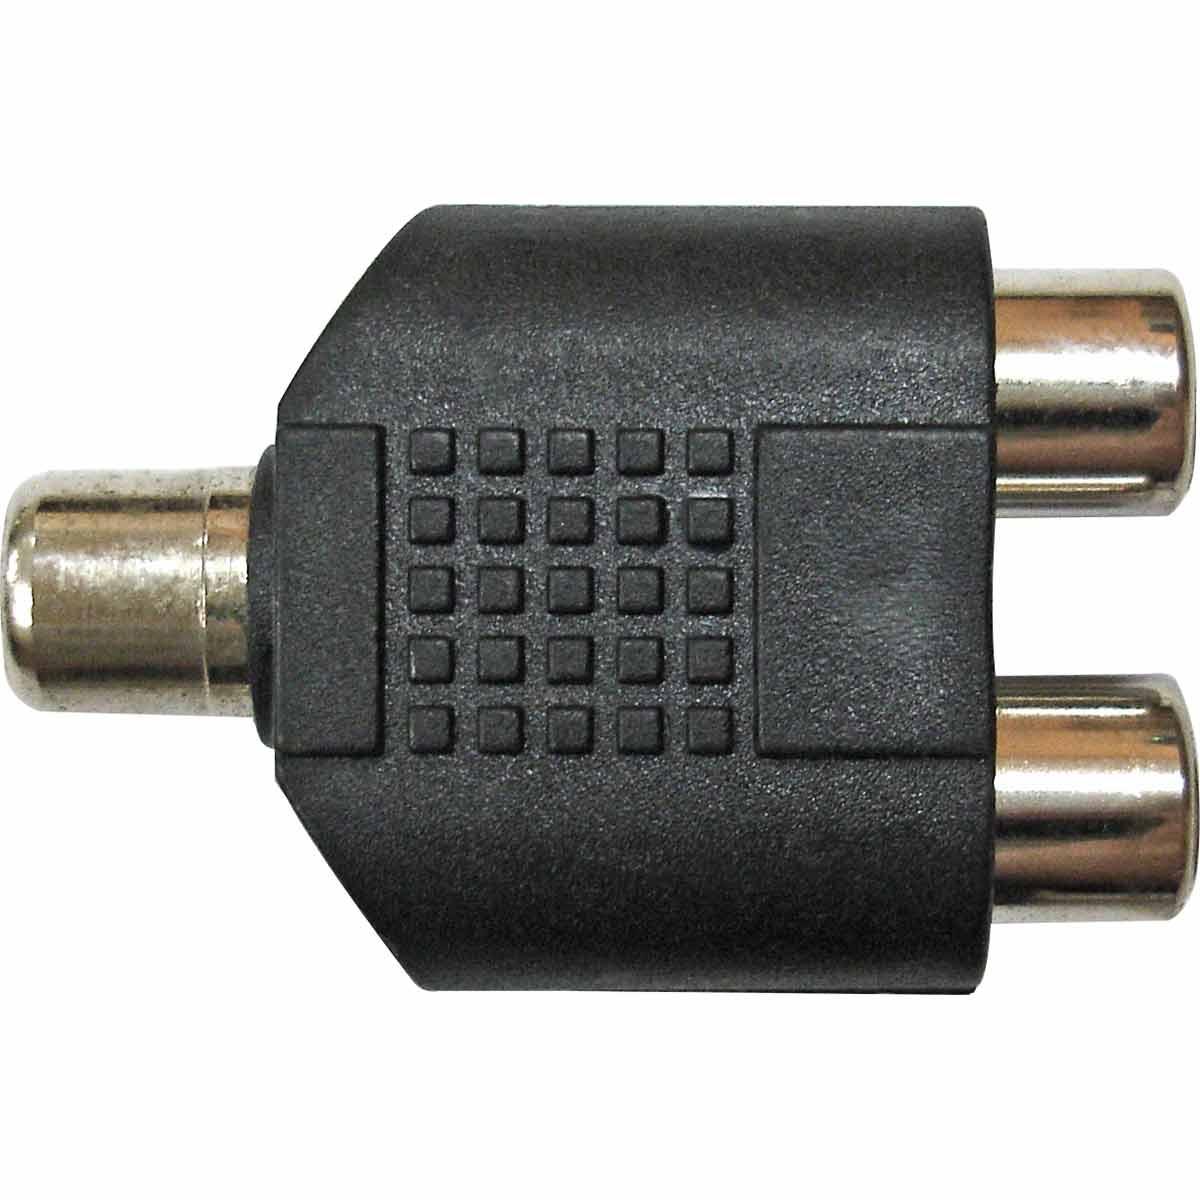 Adaptador 2x RCA F / RCA F WC 2057 AD - Wireconex